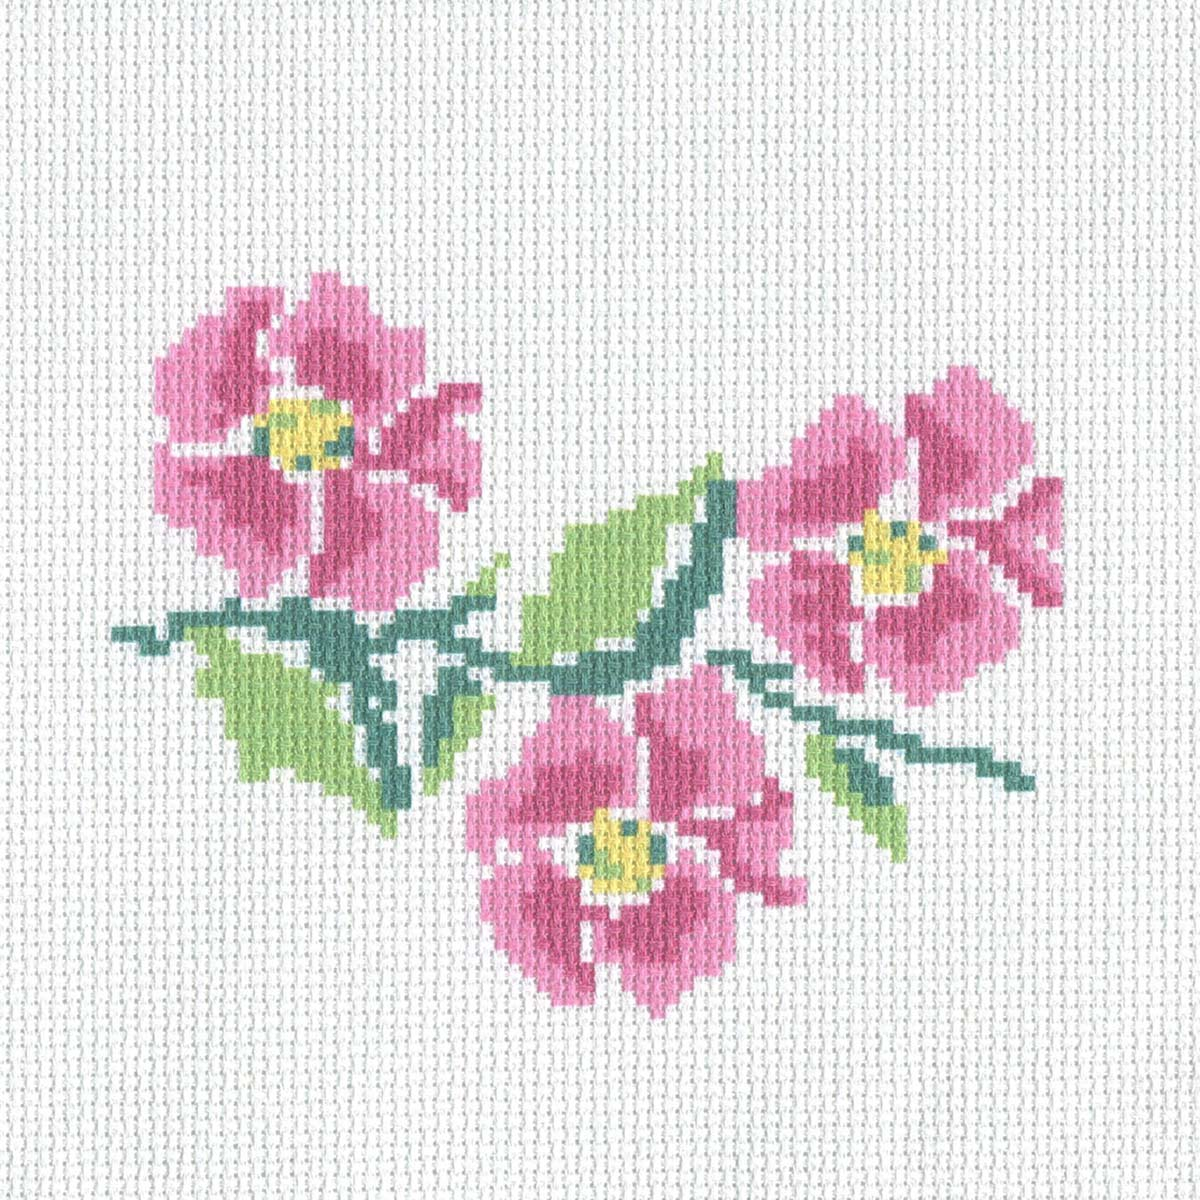 232 Набор для вышивания Hobby & Pro Kids 'Сакура' 19*19см